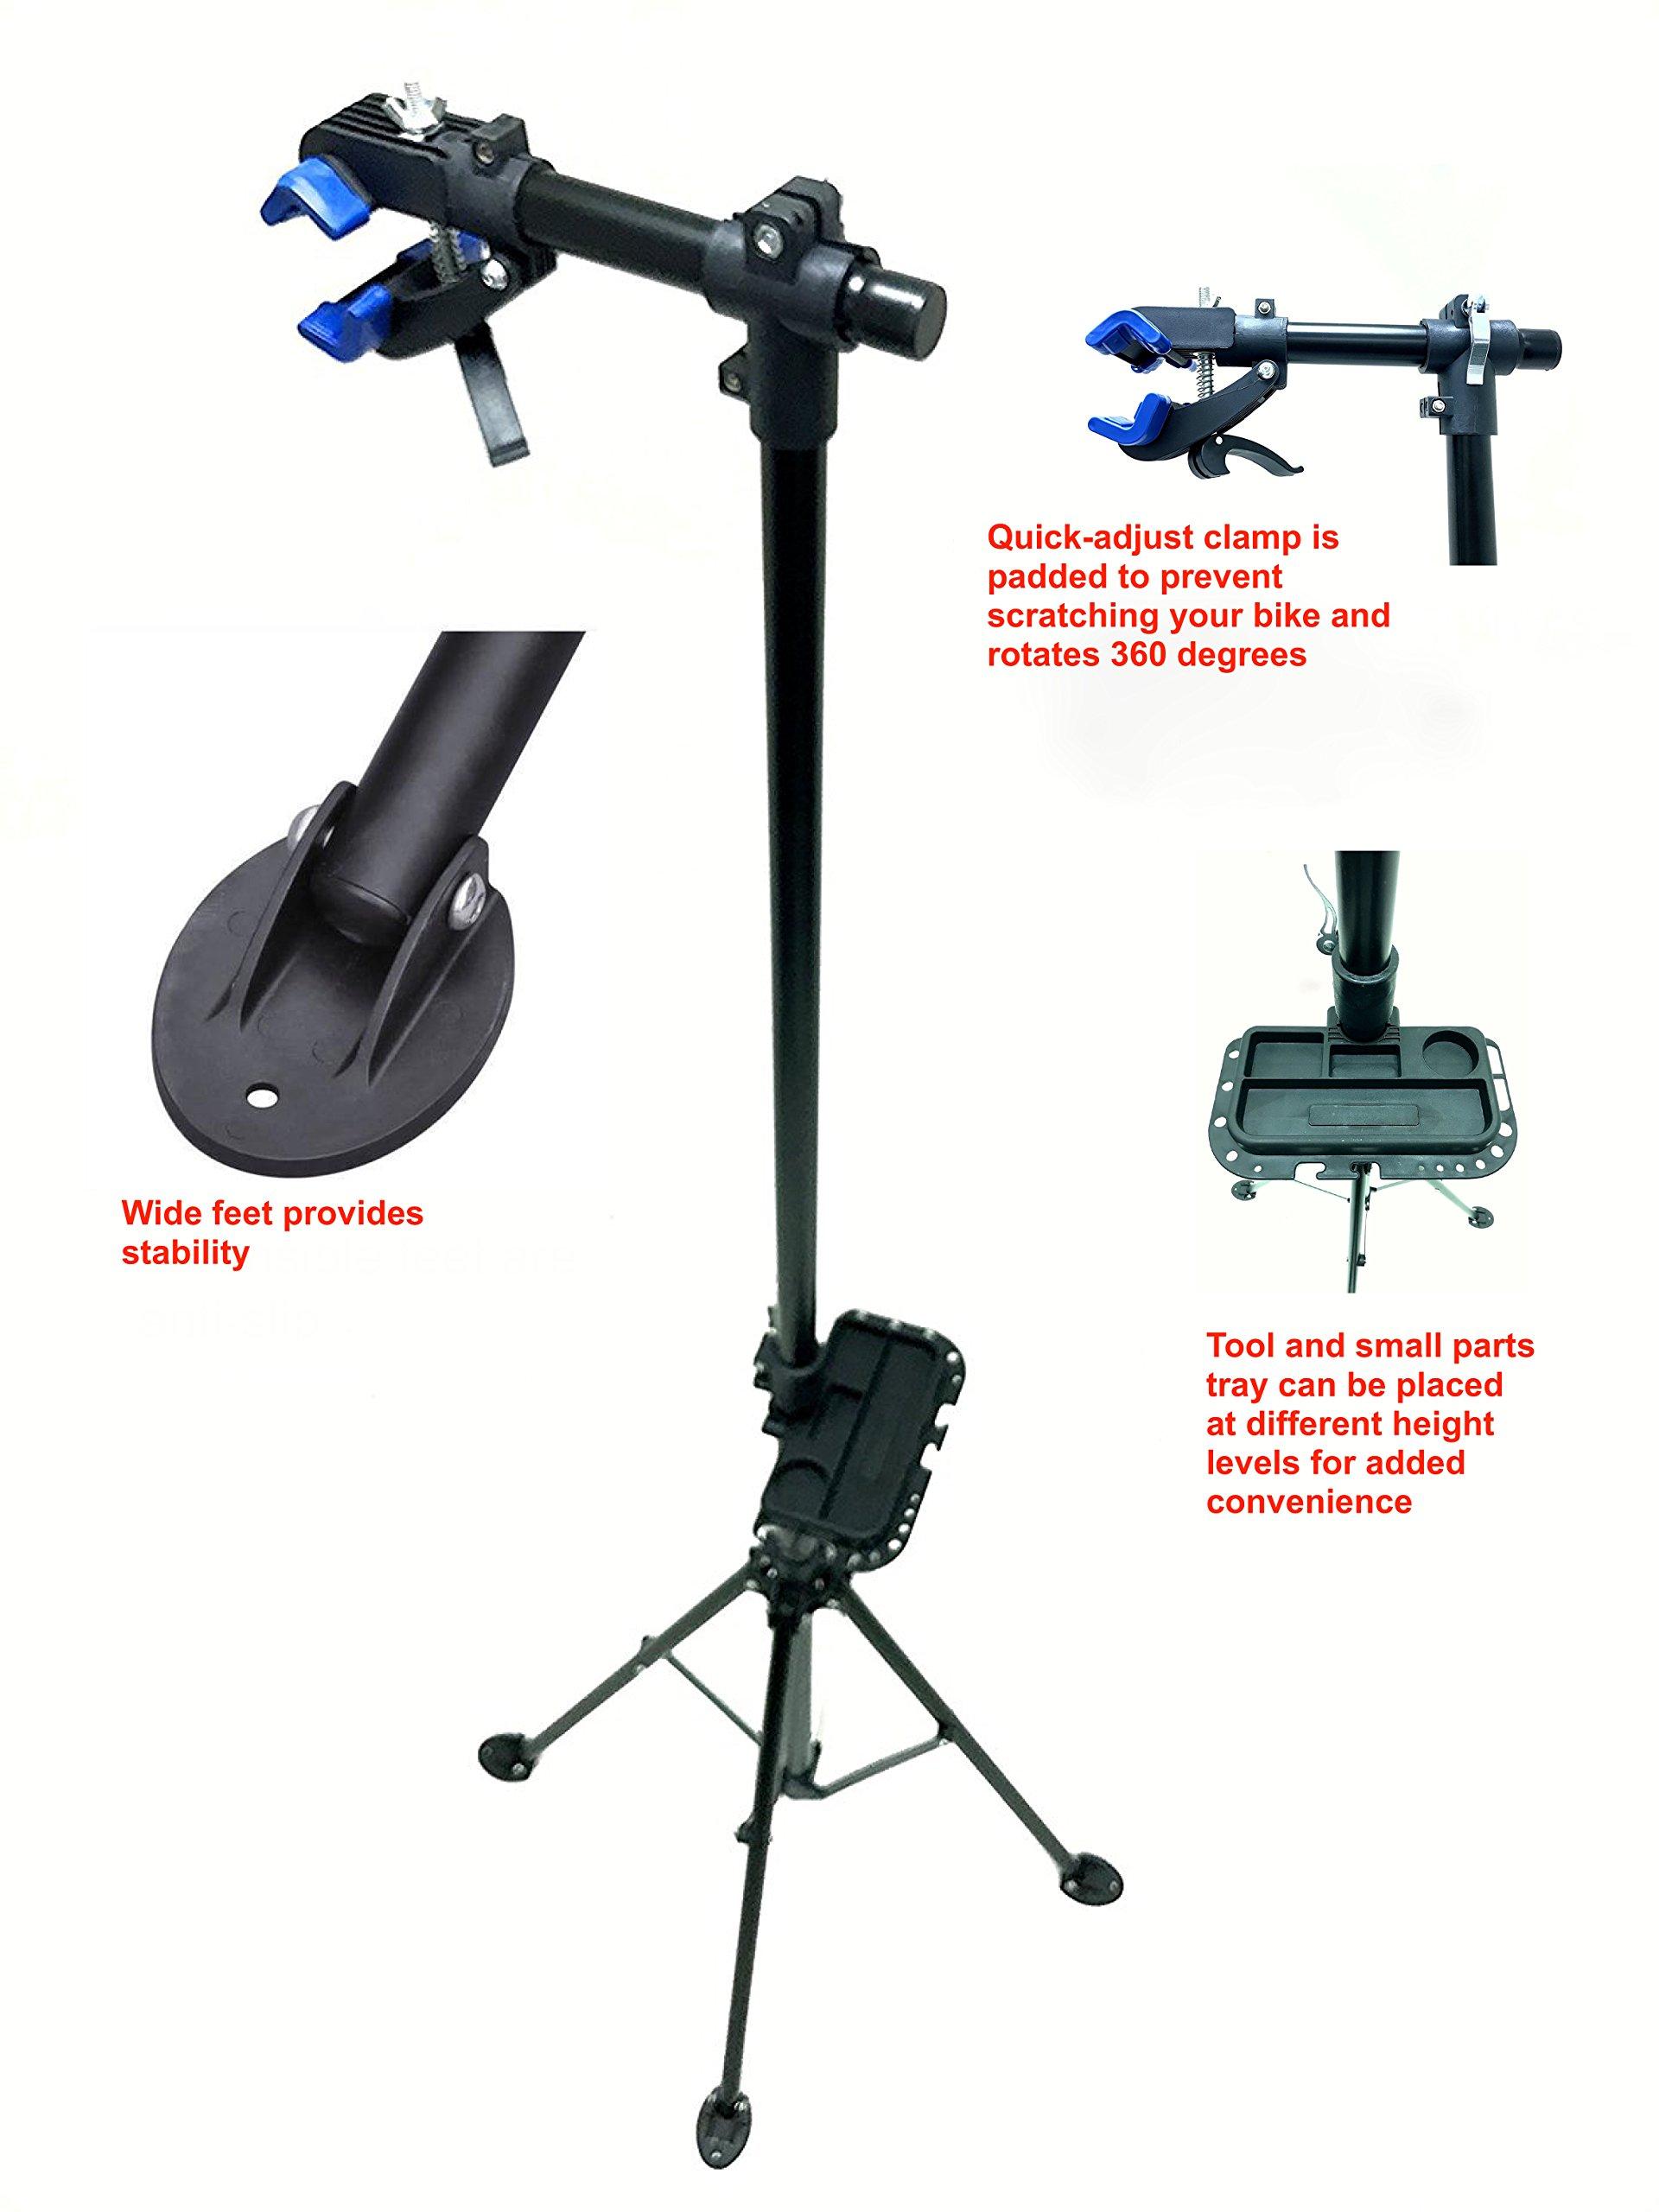 MaxxHaul 80725 Bike Repair Stand/Display with Adjustable Height & 360 Deg. Rotating Head Clamp by MaxxHaul (Image #6)